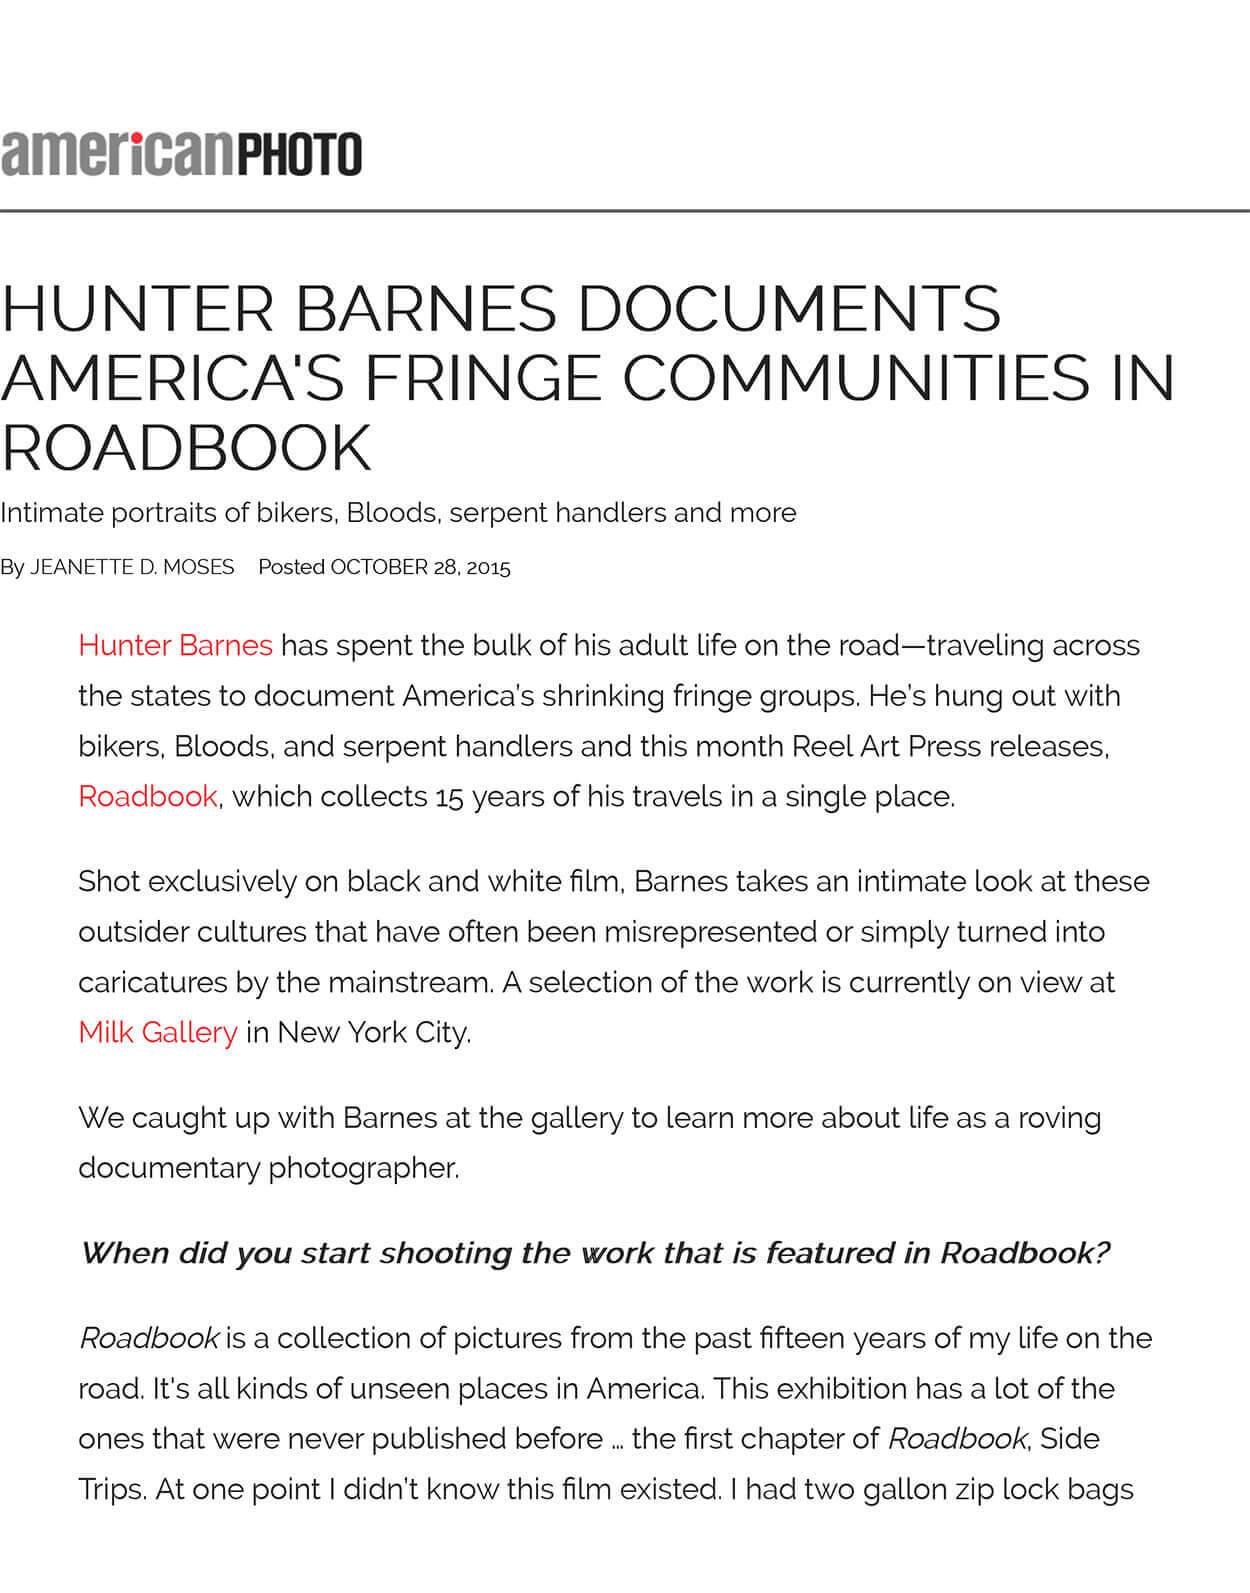 Hunter Barnes documents America's fringe communities in Roadbook - American Photo - Page 2